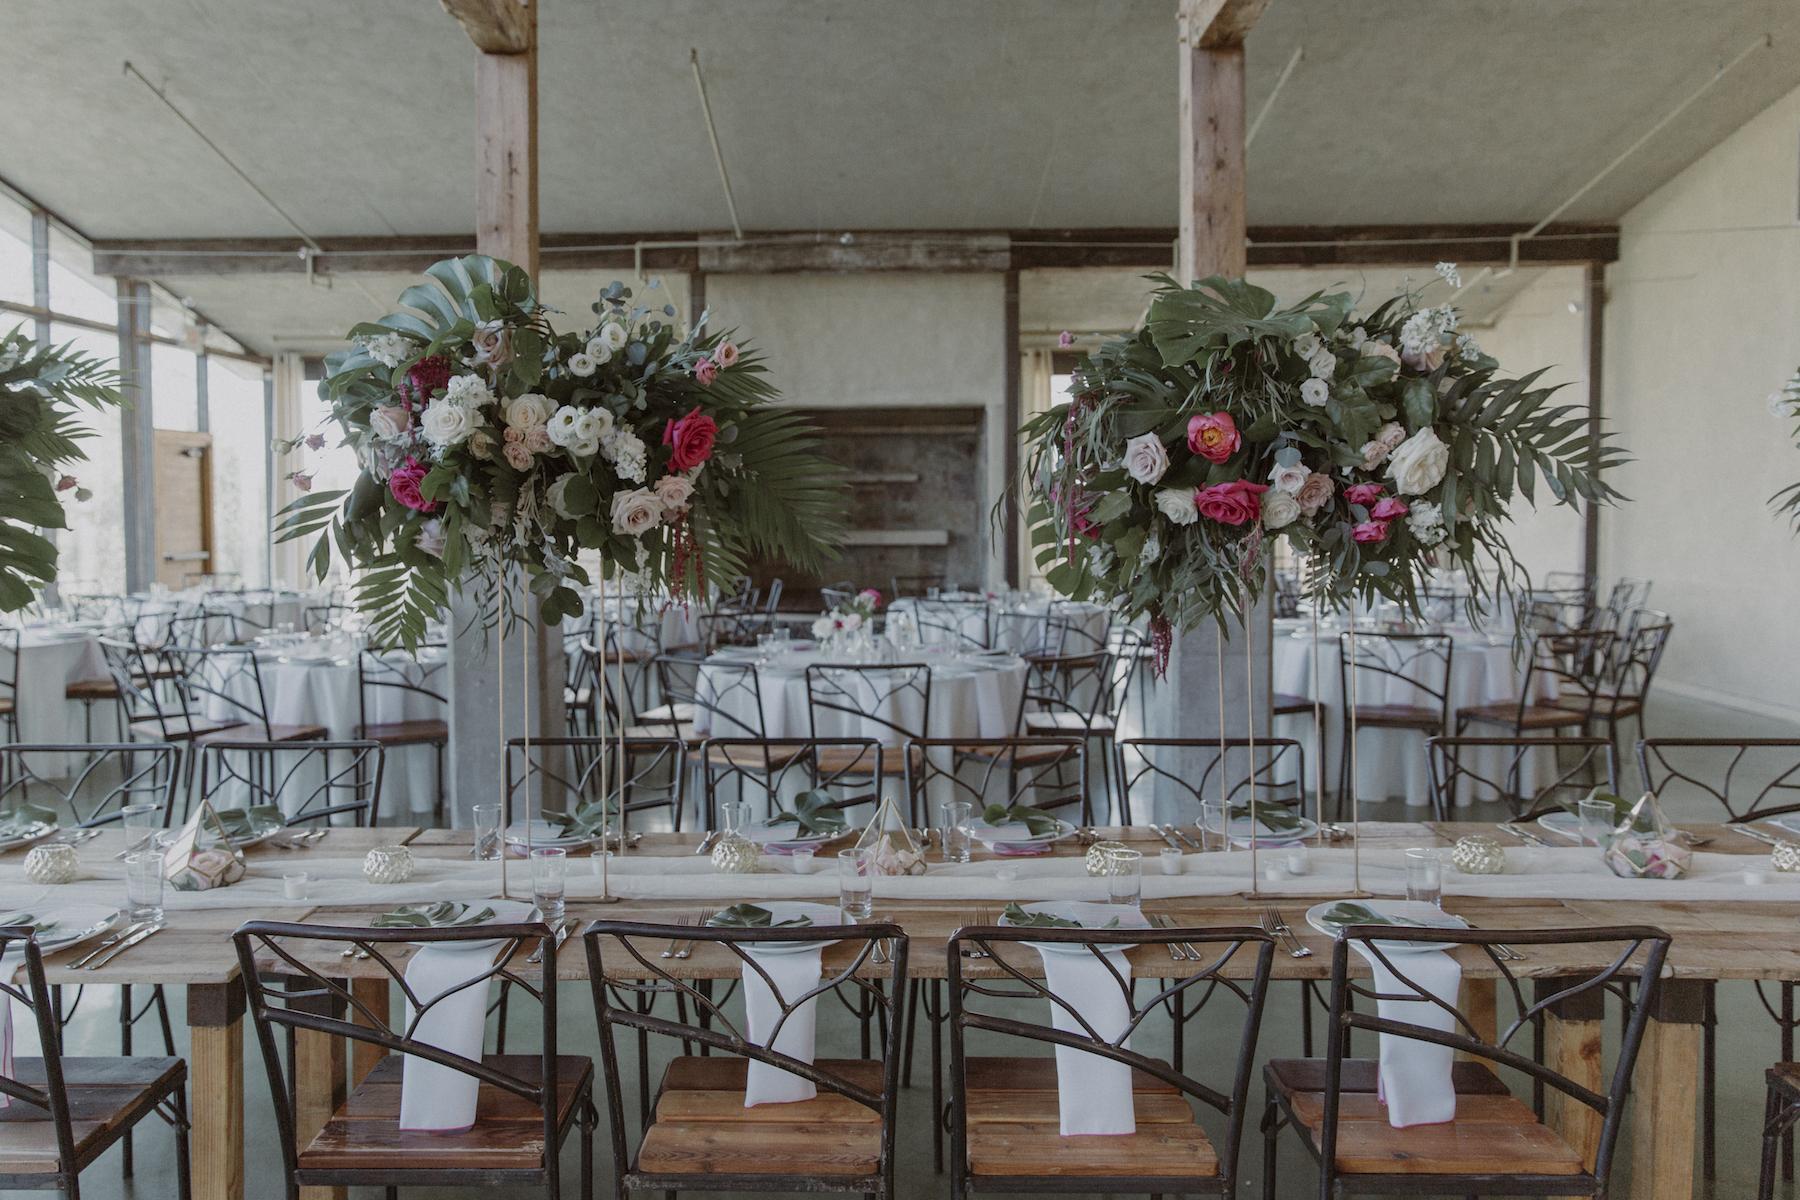 barr-mansion-wedding-austin-texas8836.JPG